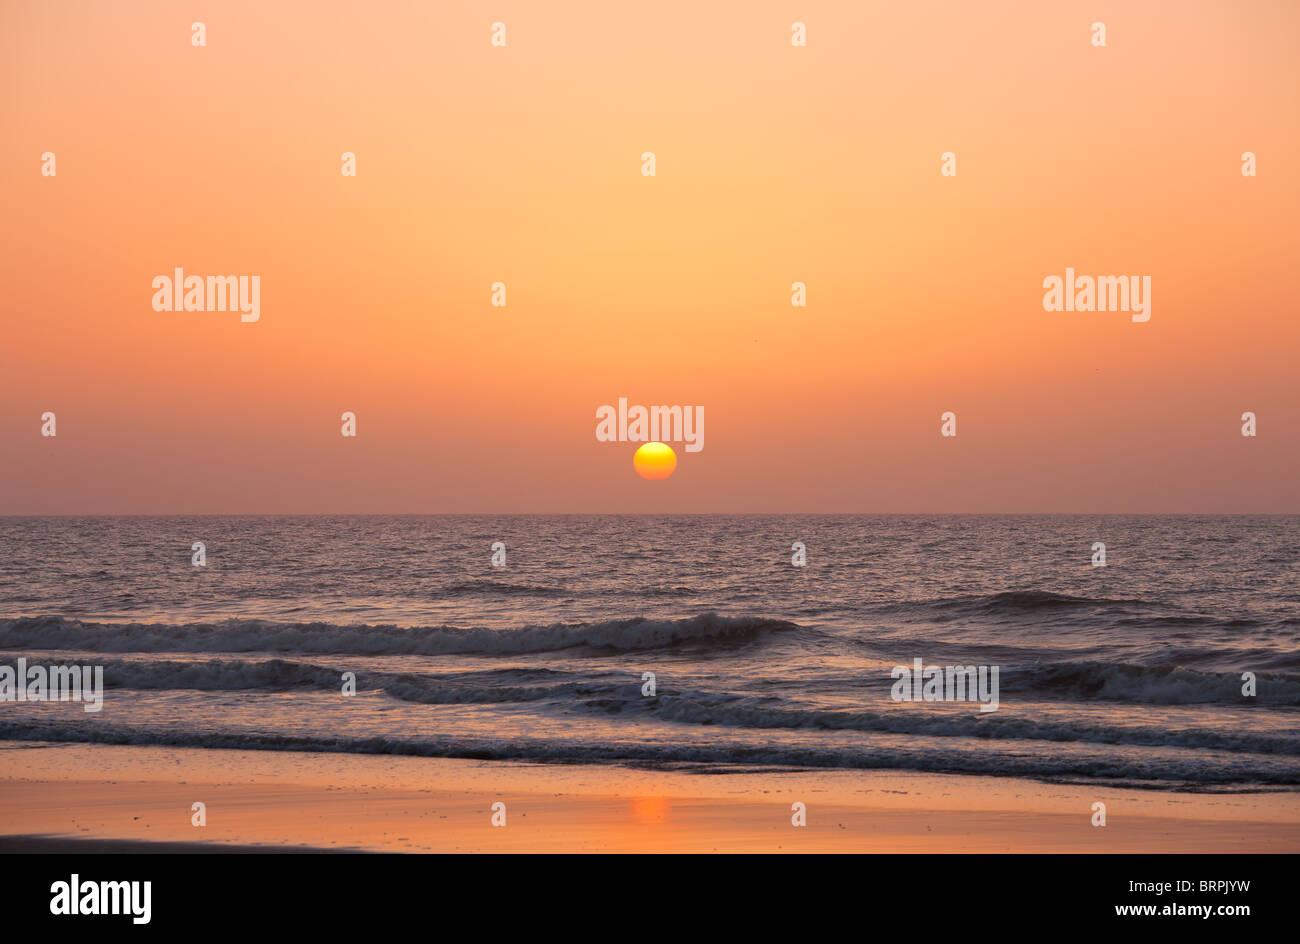 Rising sun over the ocean - Stock Image